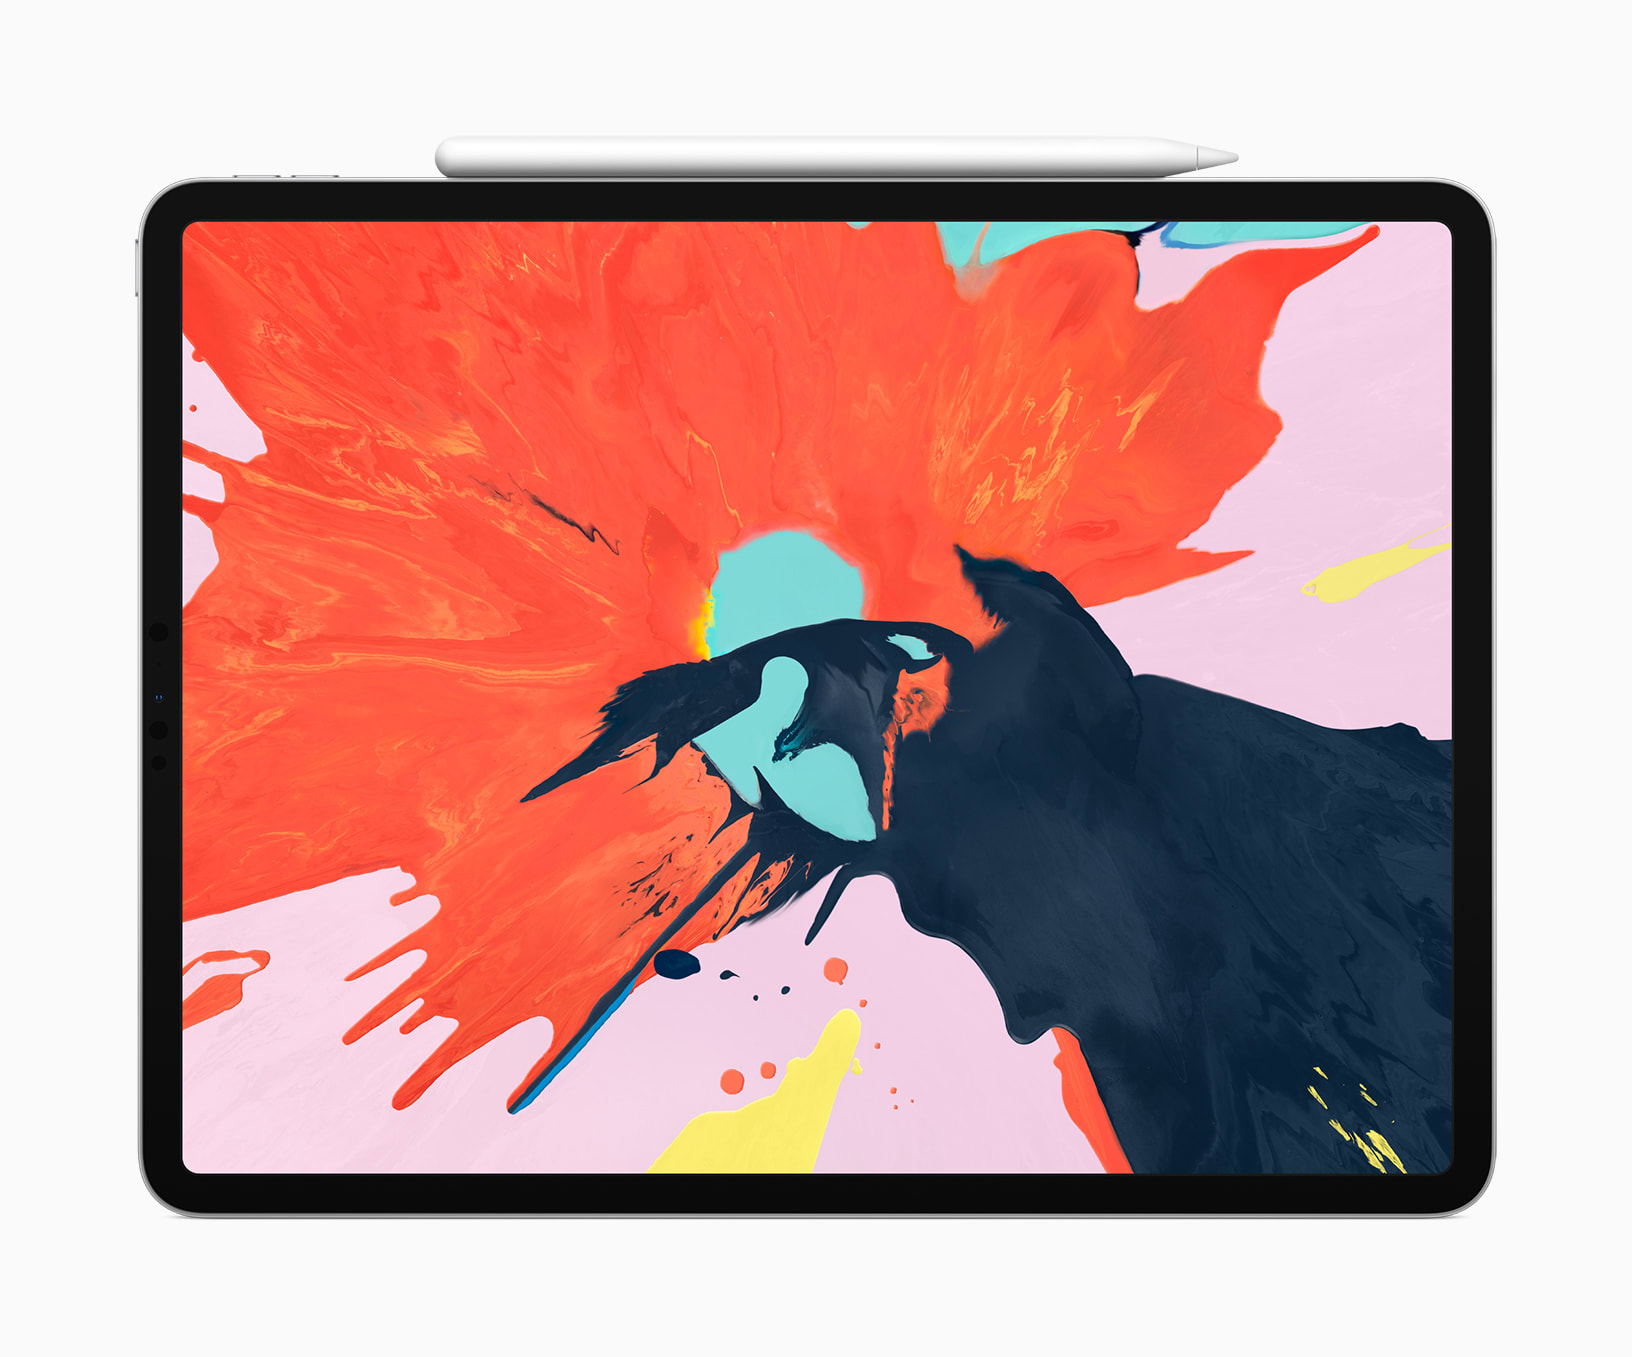 iPad Pro 12.9-inch (2018)